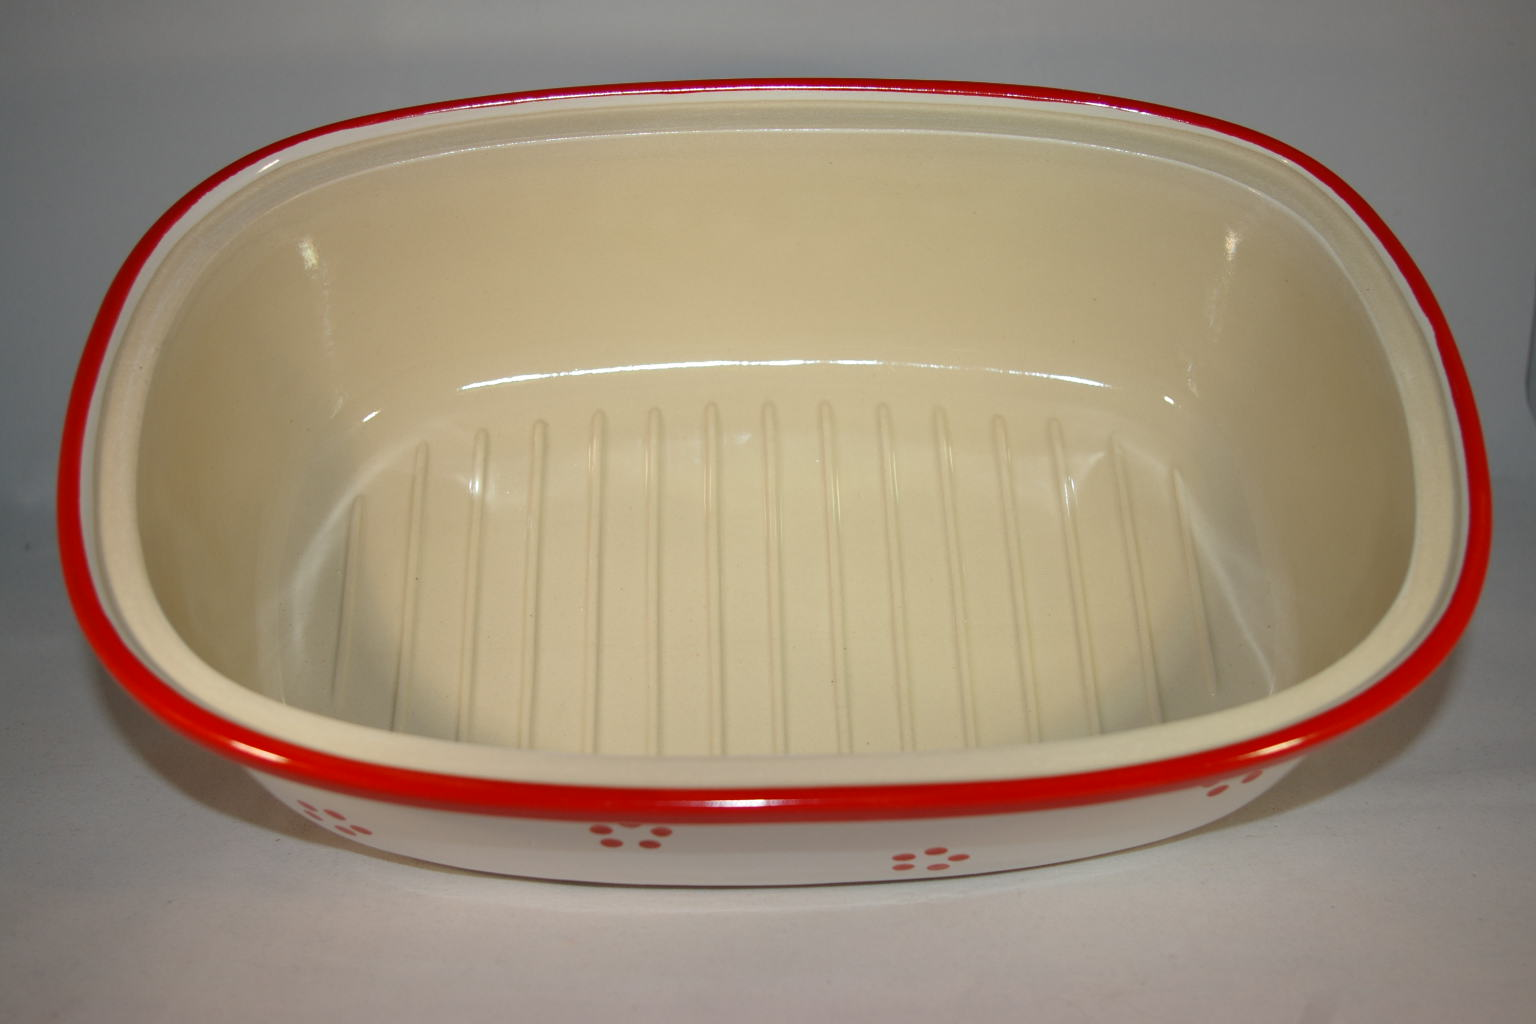 brottopf 30 cm retro rot keramik seifert ronny seifert toepferei seifert ihr namenstassen. Black Bedroom Furniture Sets. Home Design Ideas